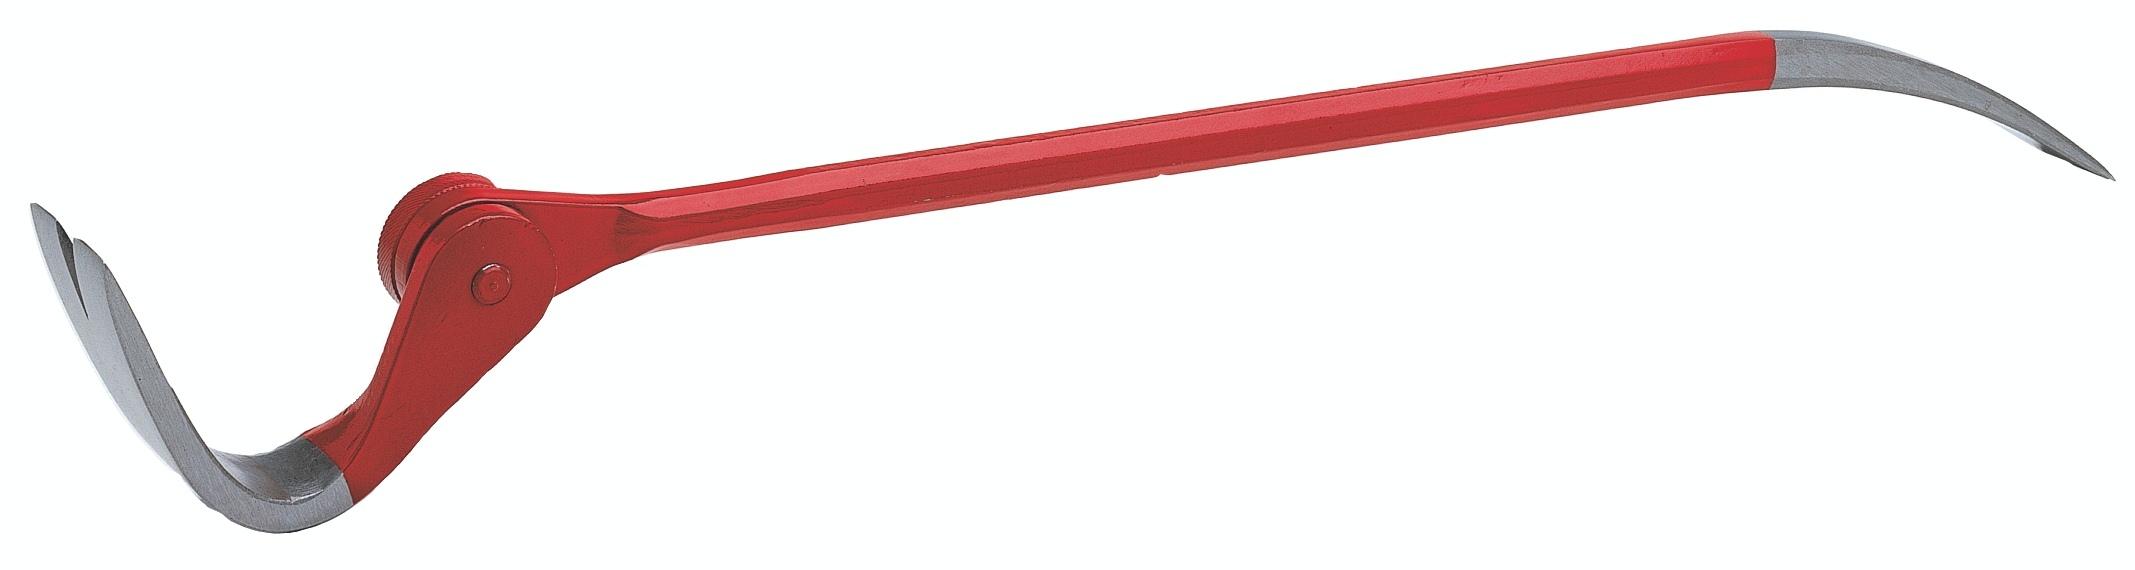 Hultafors Wrecking Bar Steel Adjustable 109 SB HU-824015